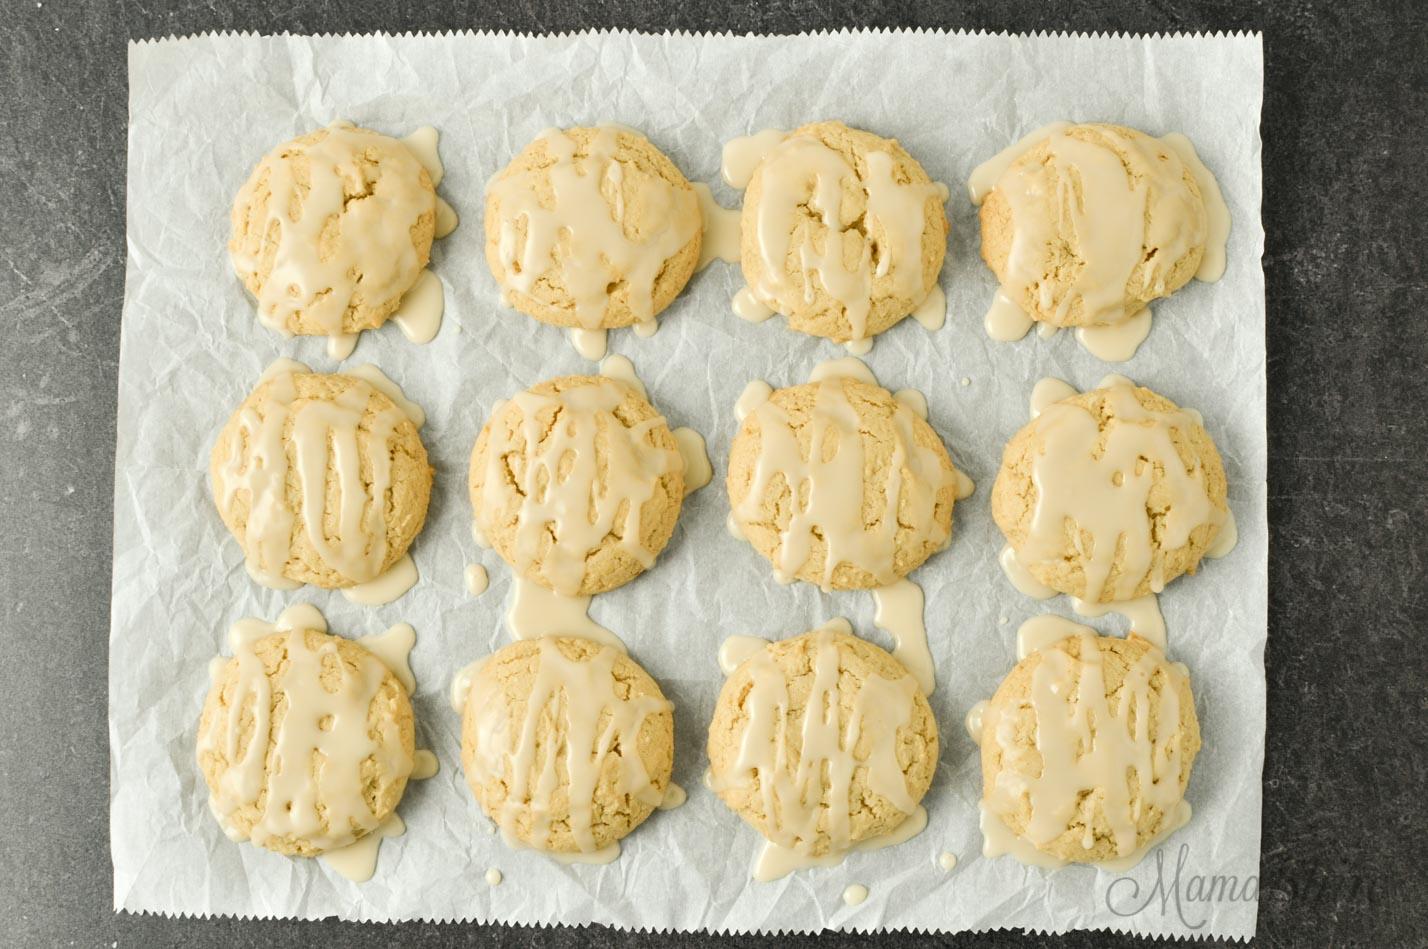 Gluten-free maple brown sugar cookies.